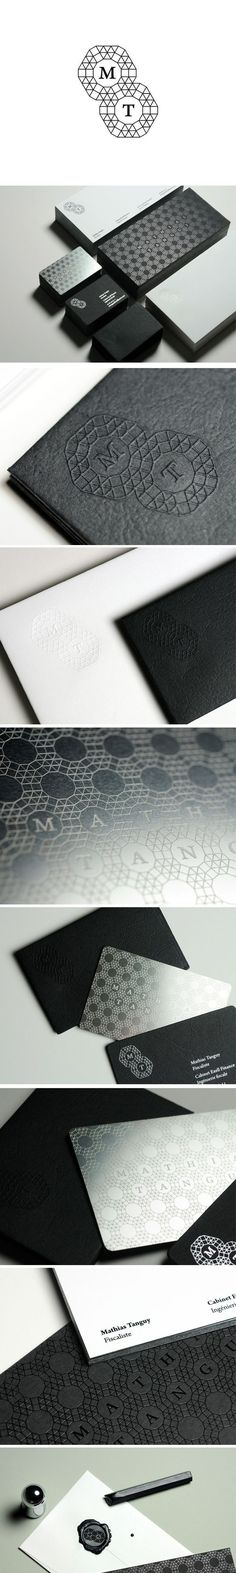 Stationery Design for Mathias Tanguy via Branding Served.